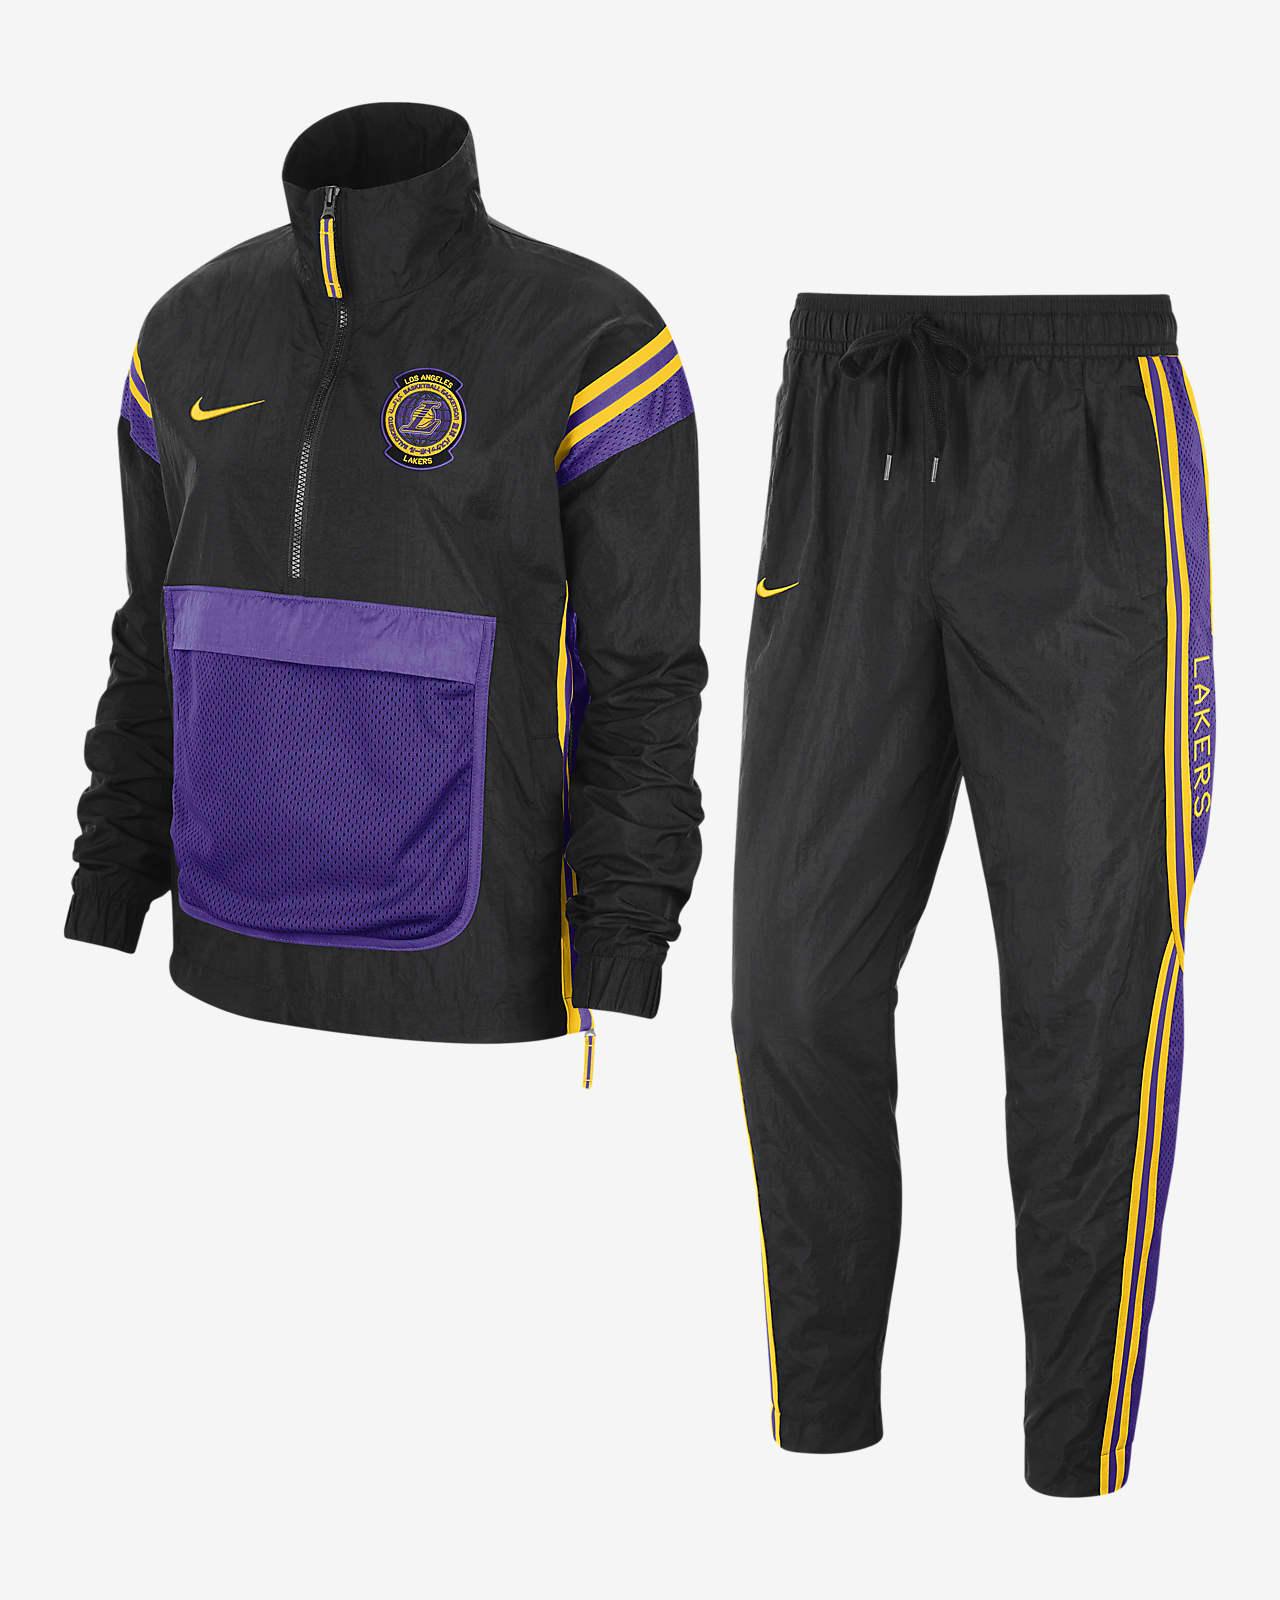 Lakers Courtside Women's Nike NBA Tracksuit